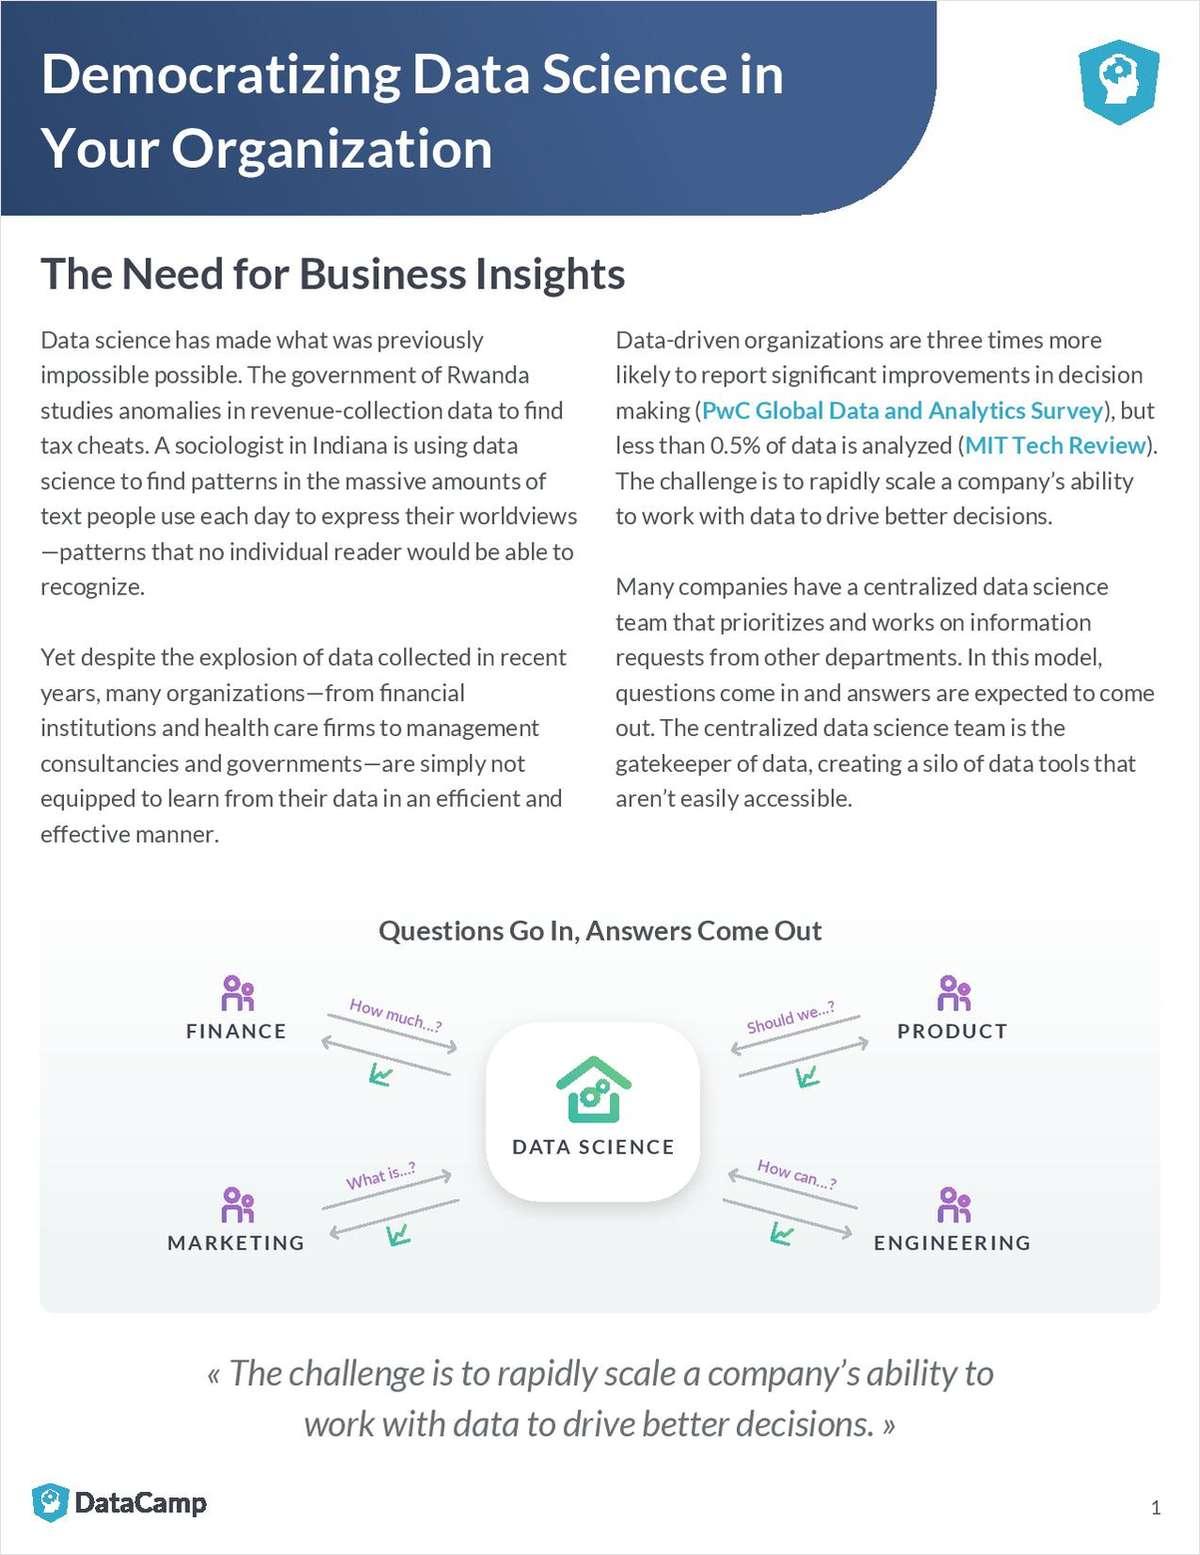 Democratizing Data Science in Your Organization